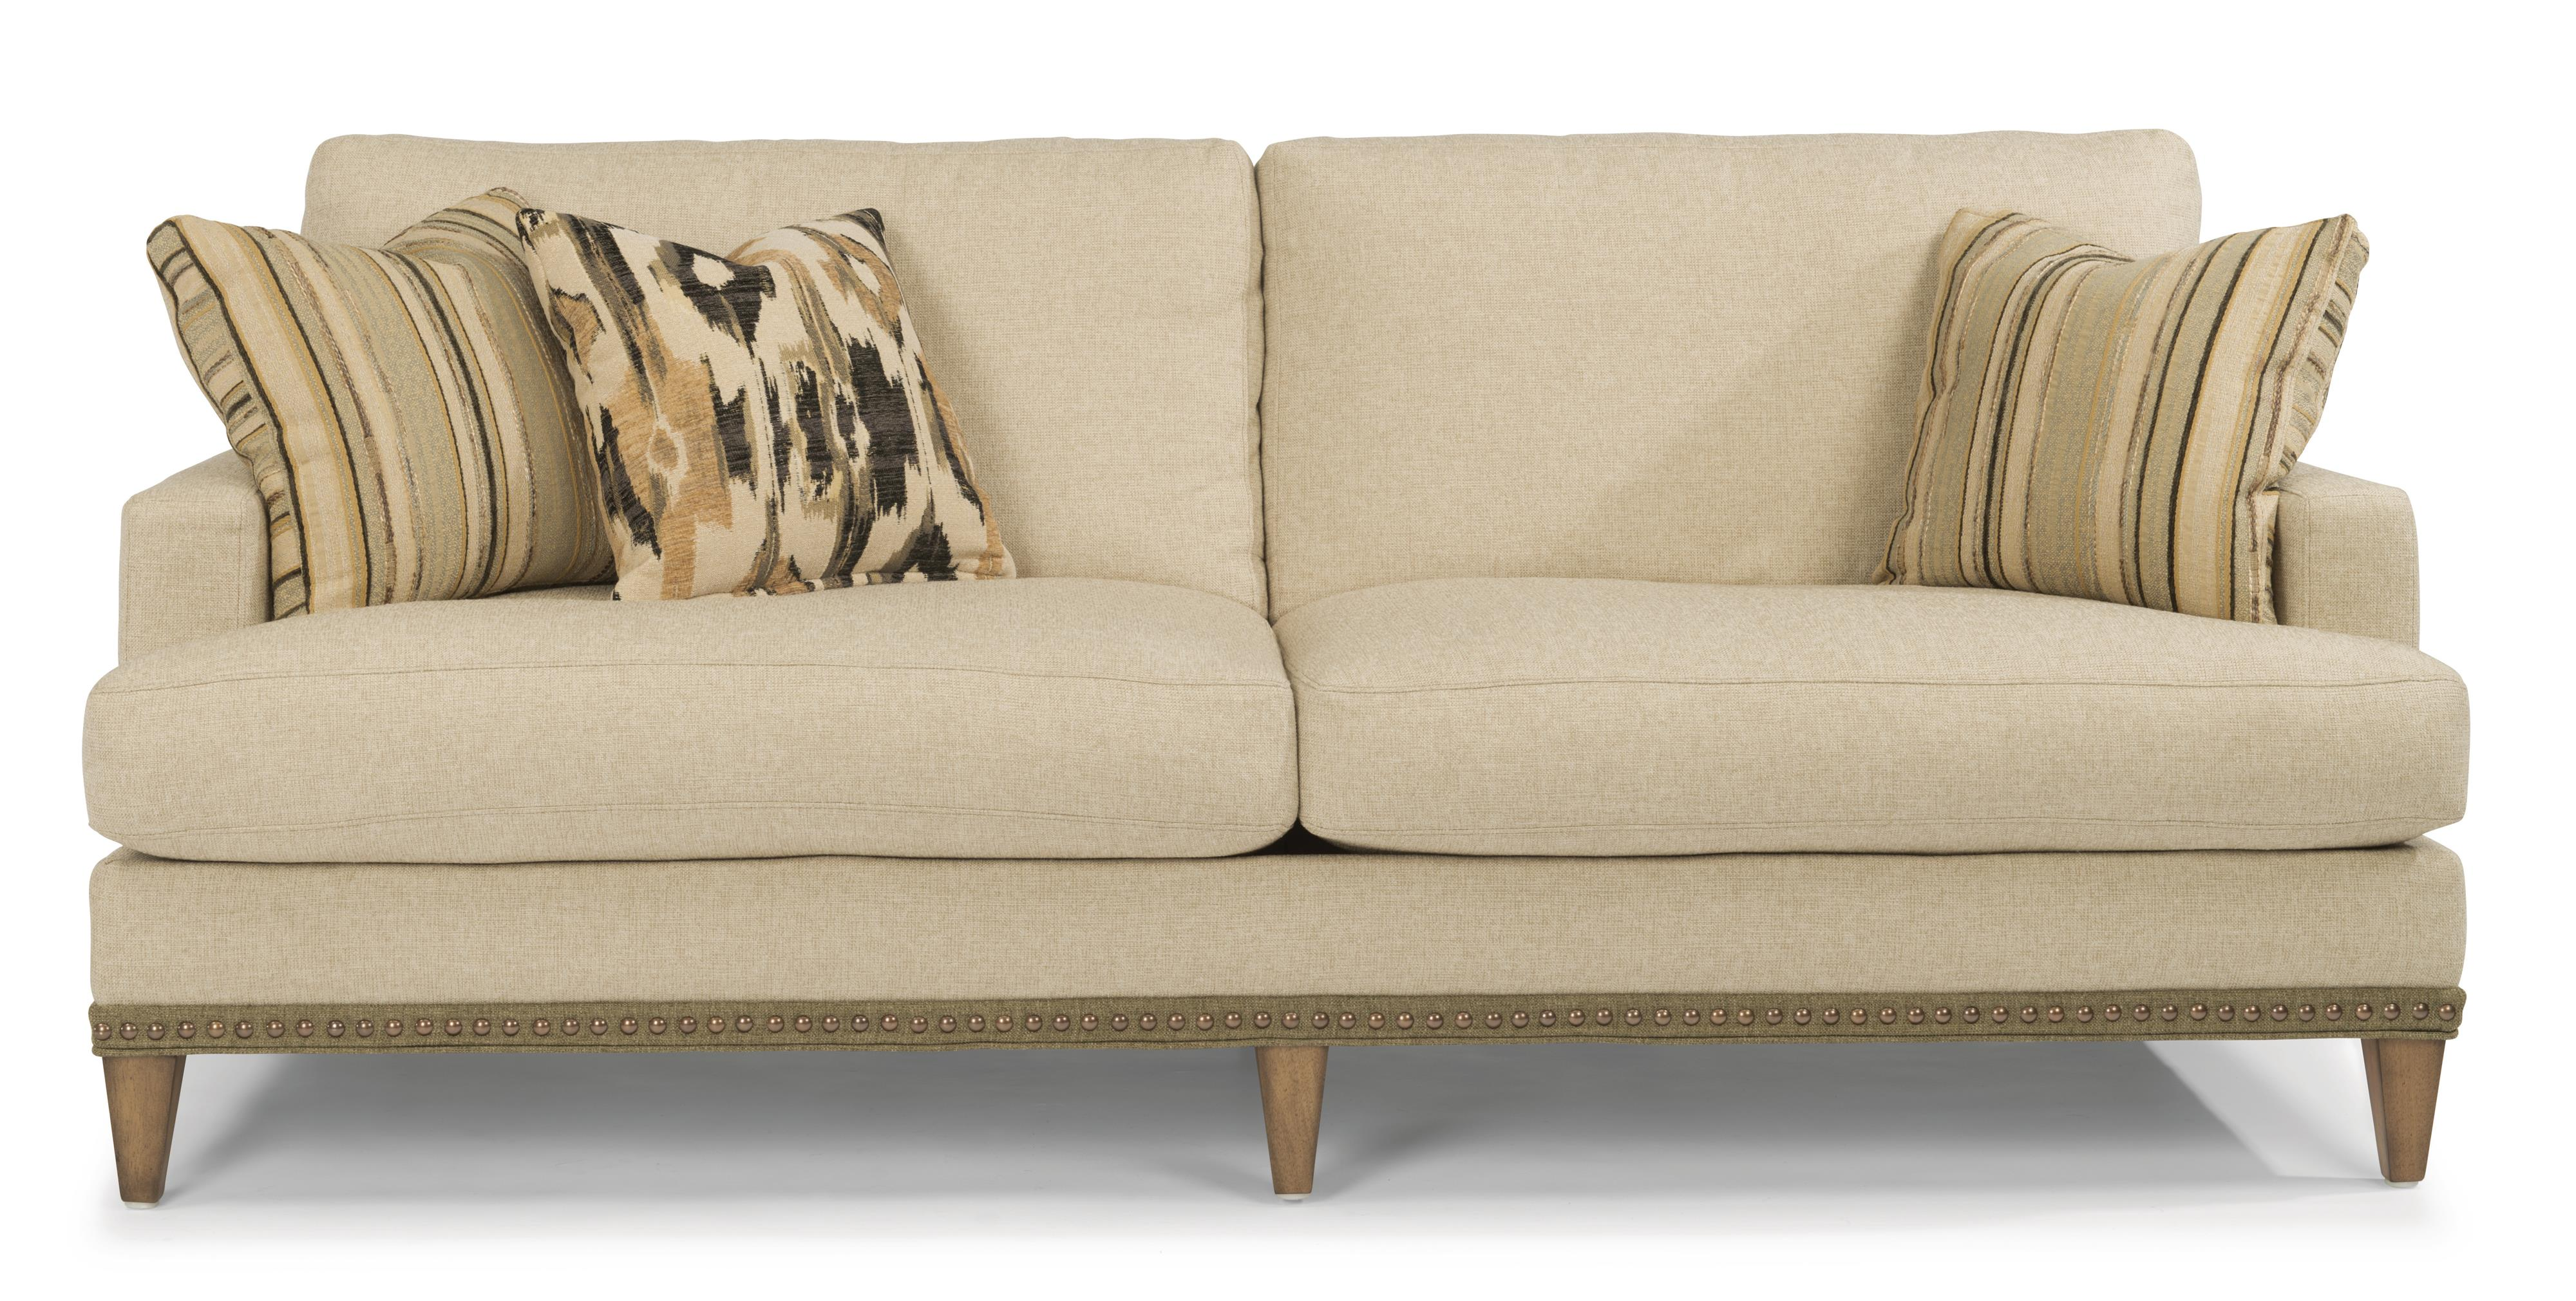 Flexsteel Ocean Sofa w/ Nails - Item Number: 7367-31-143-80